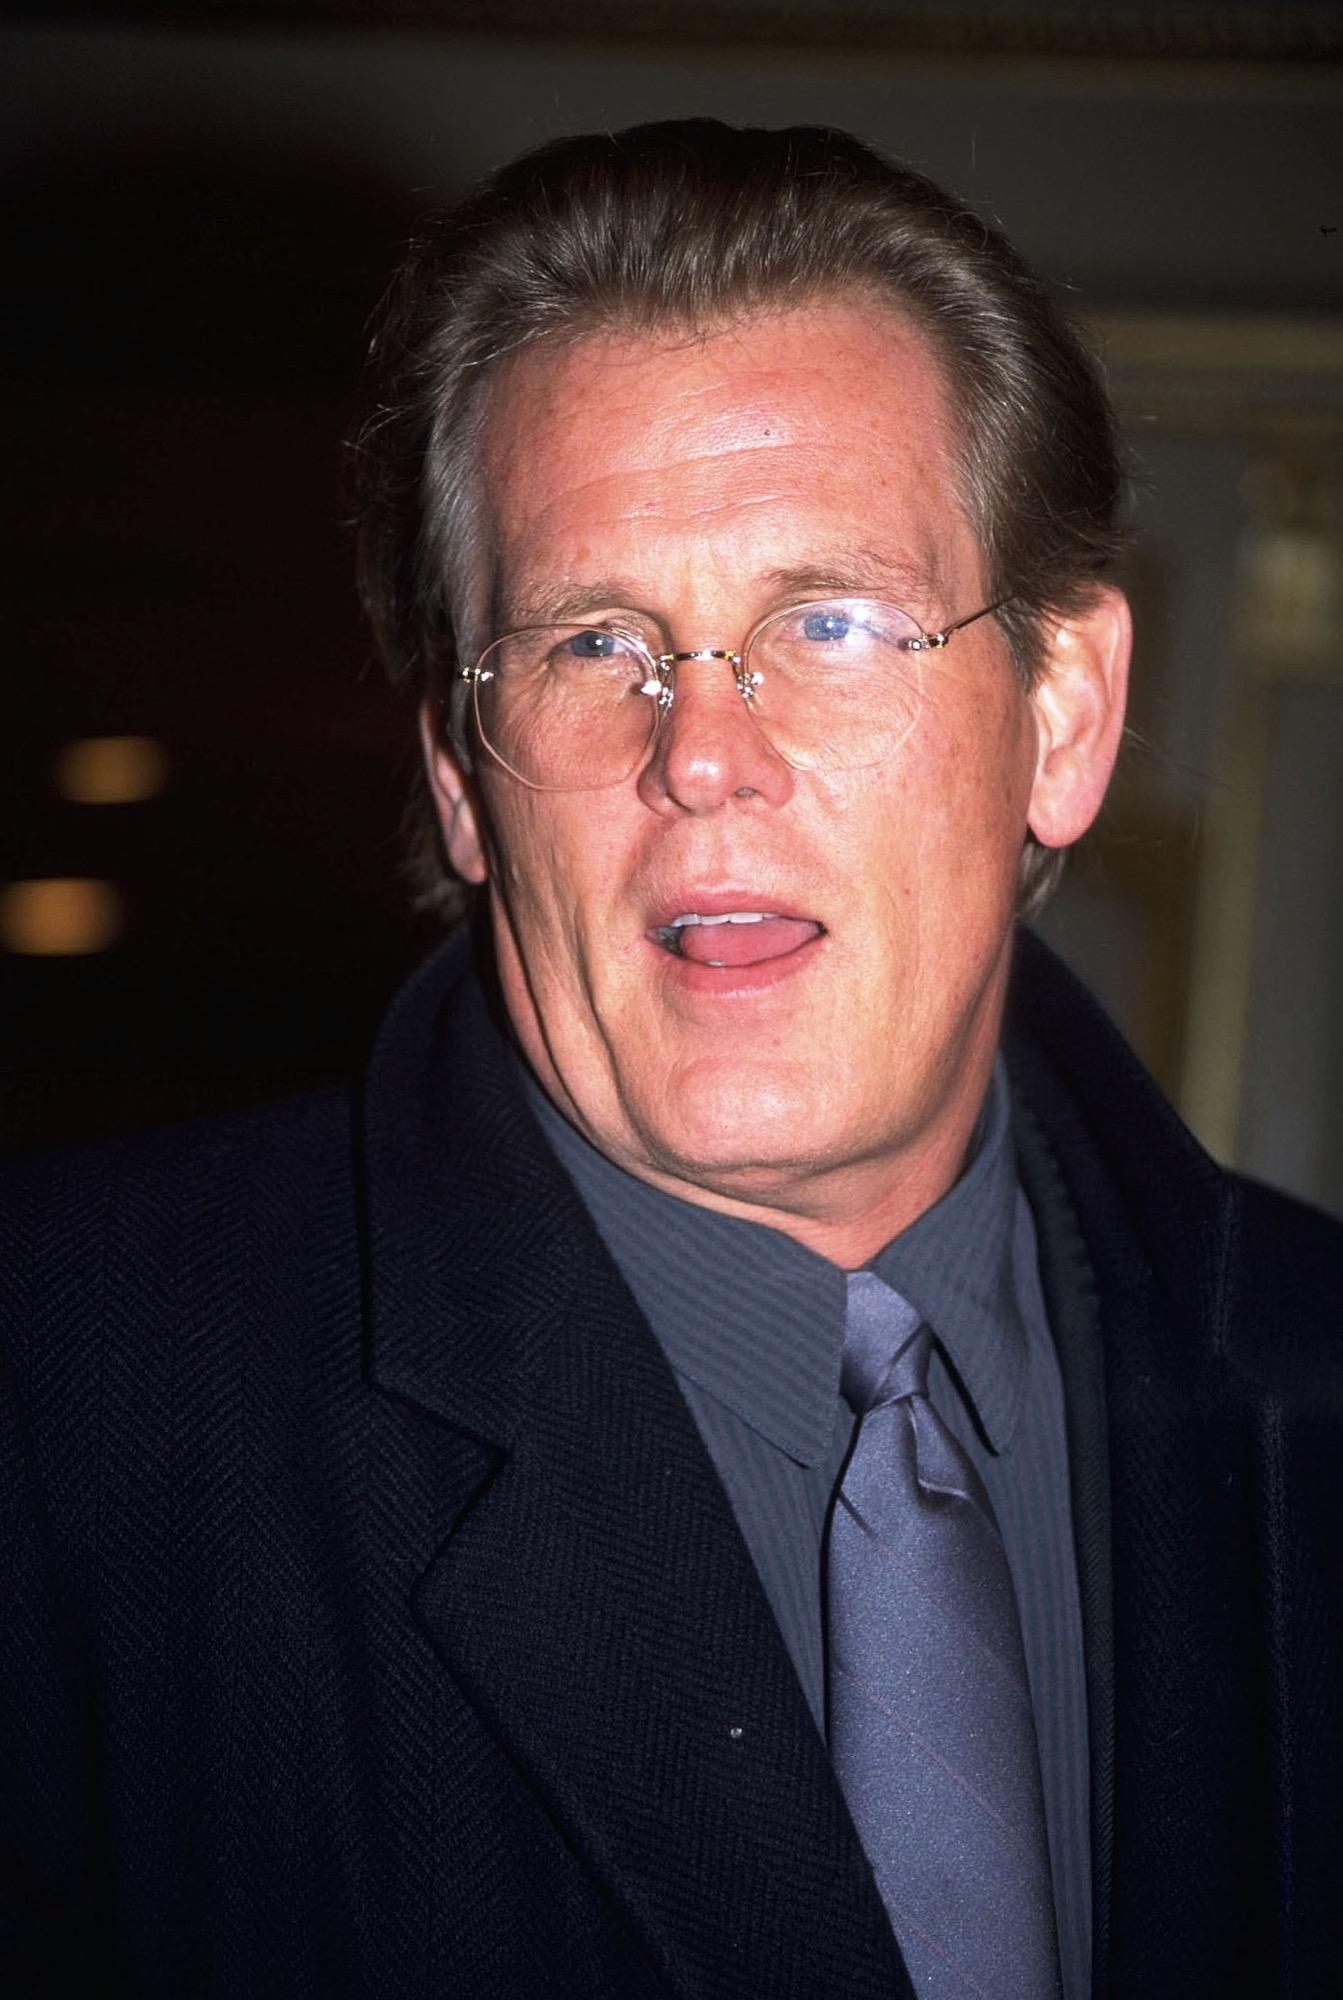 Sexiest Man Alive 1992 - Nick Nolte